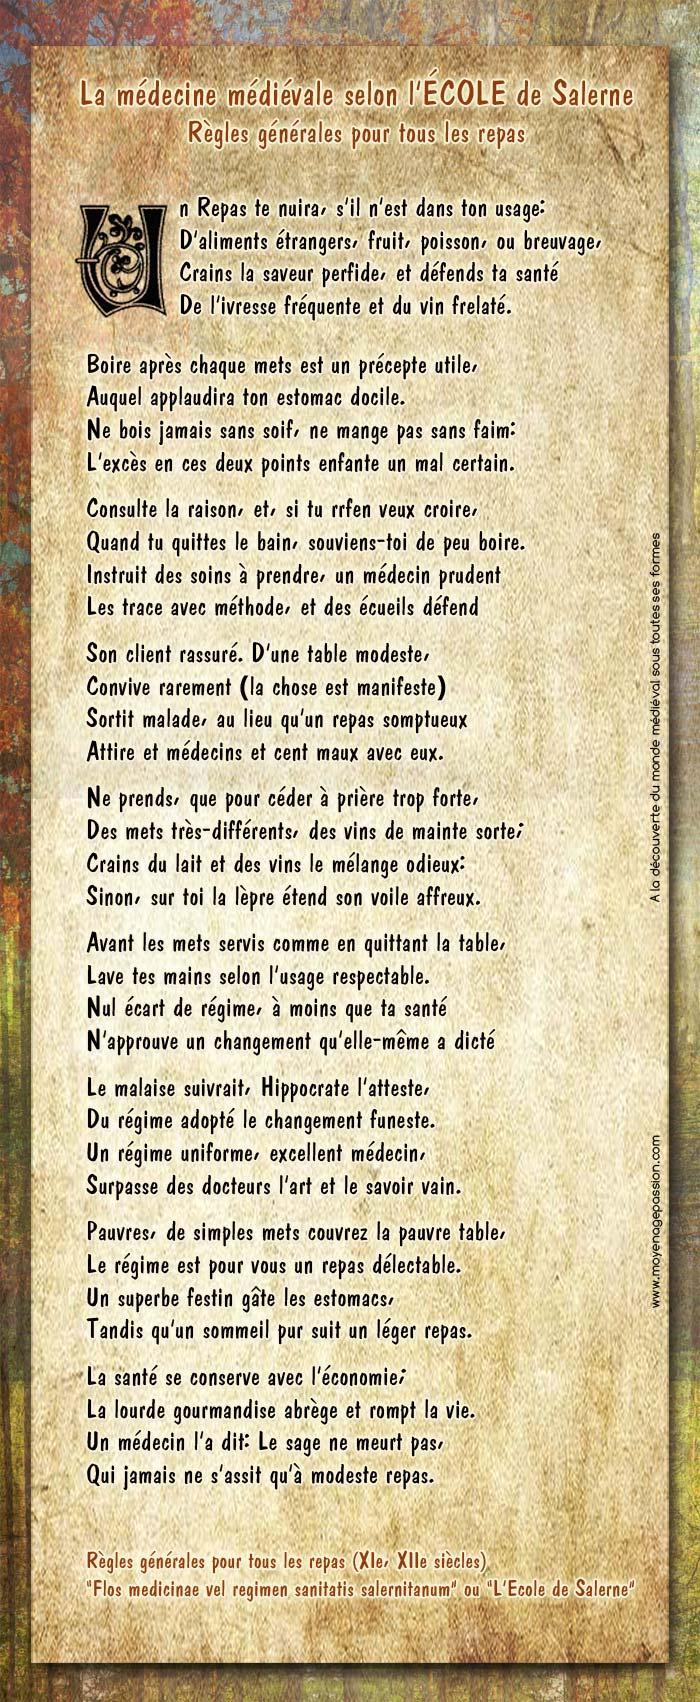 ecole_salerne_citation_medecine_medievale_regles_repas_alimentation_XIIe_moyen-age_central